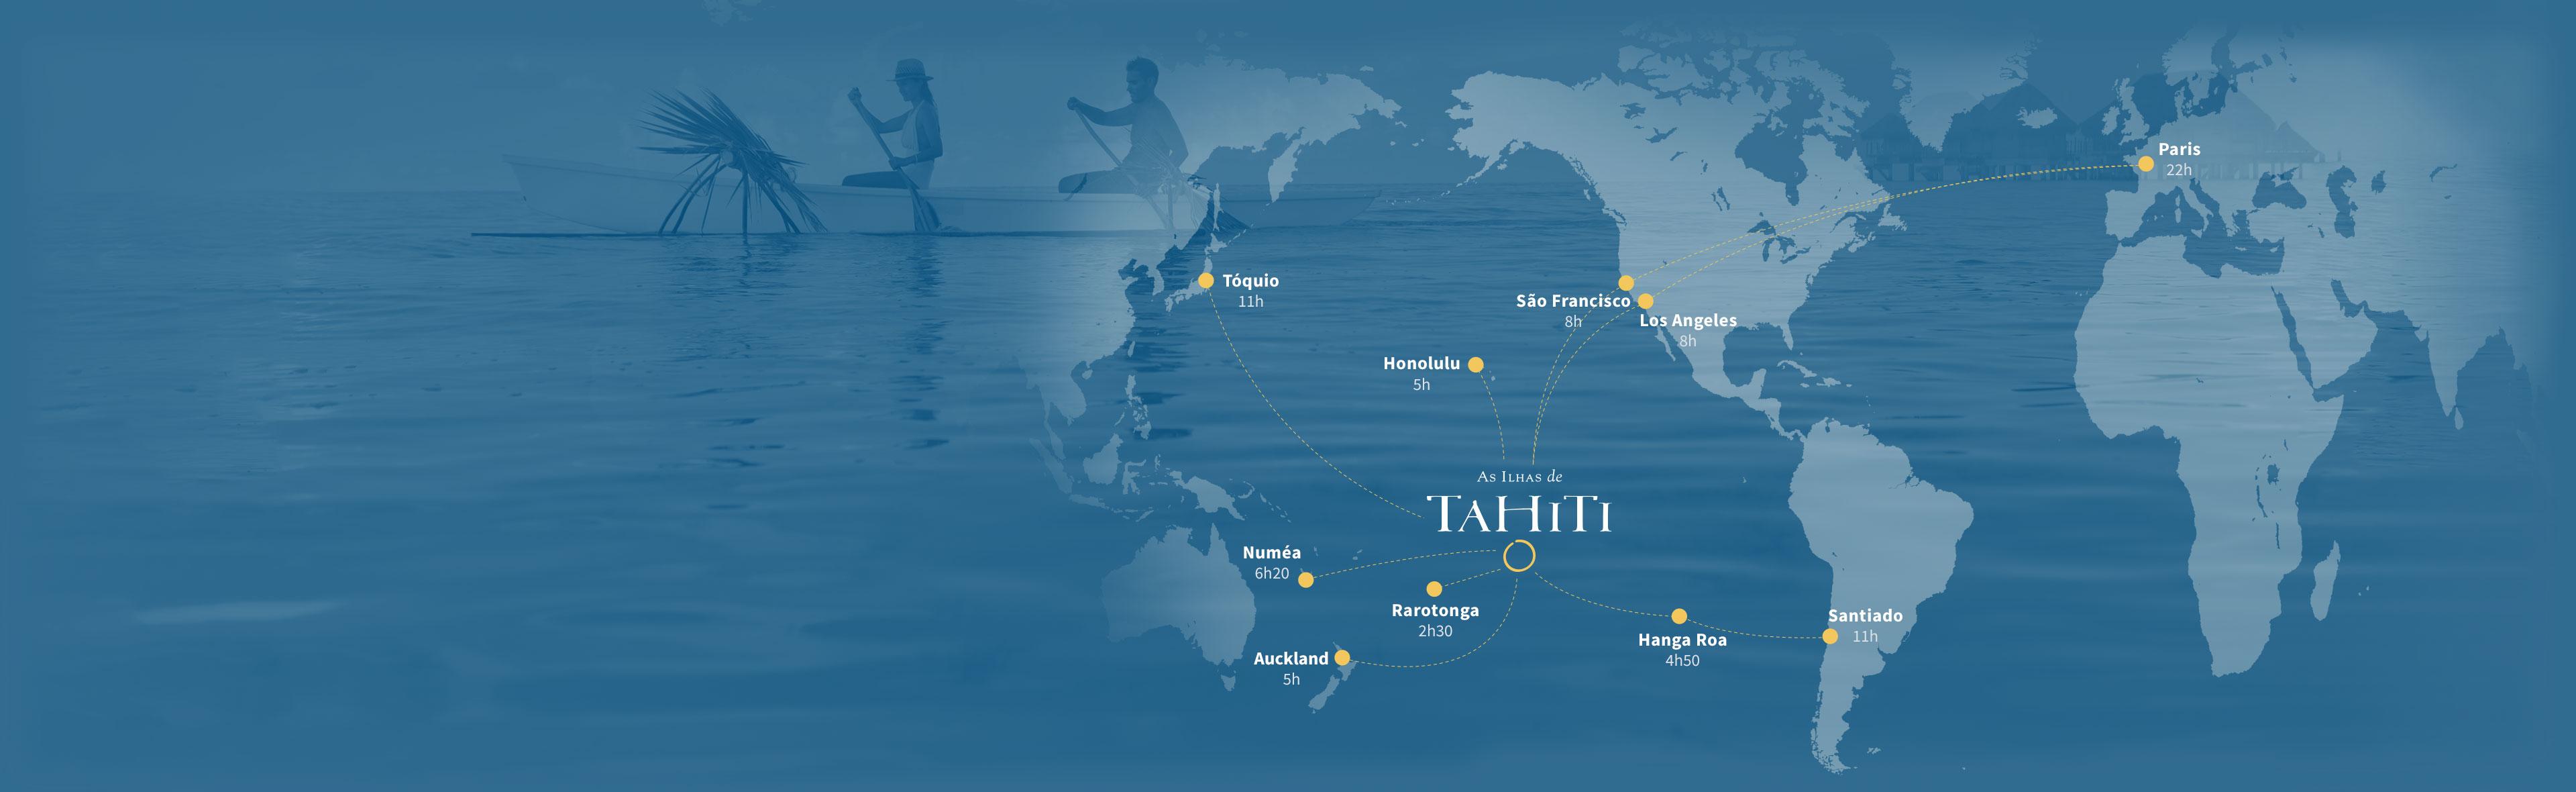 tahiti-homepage-map-d_portuguese | Tahiti Tourisme